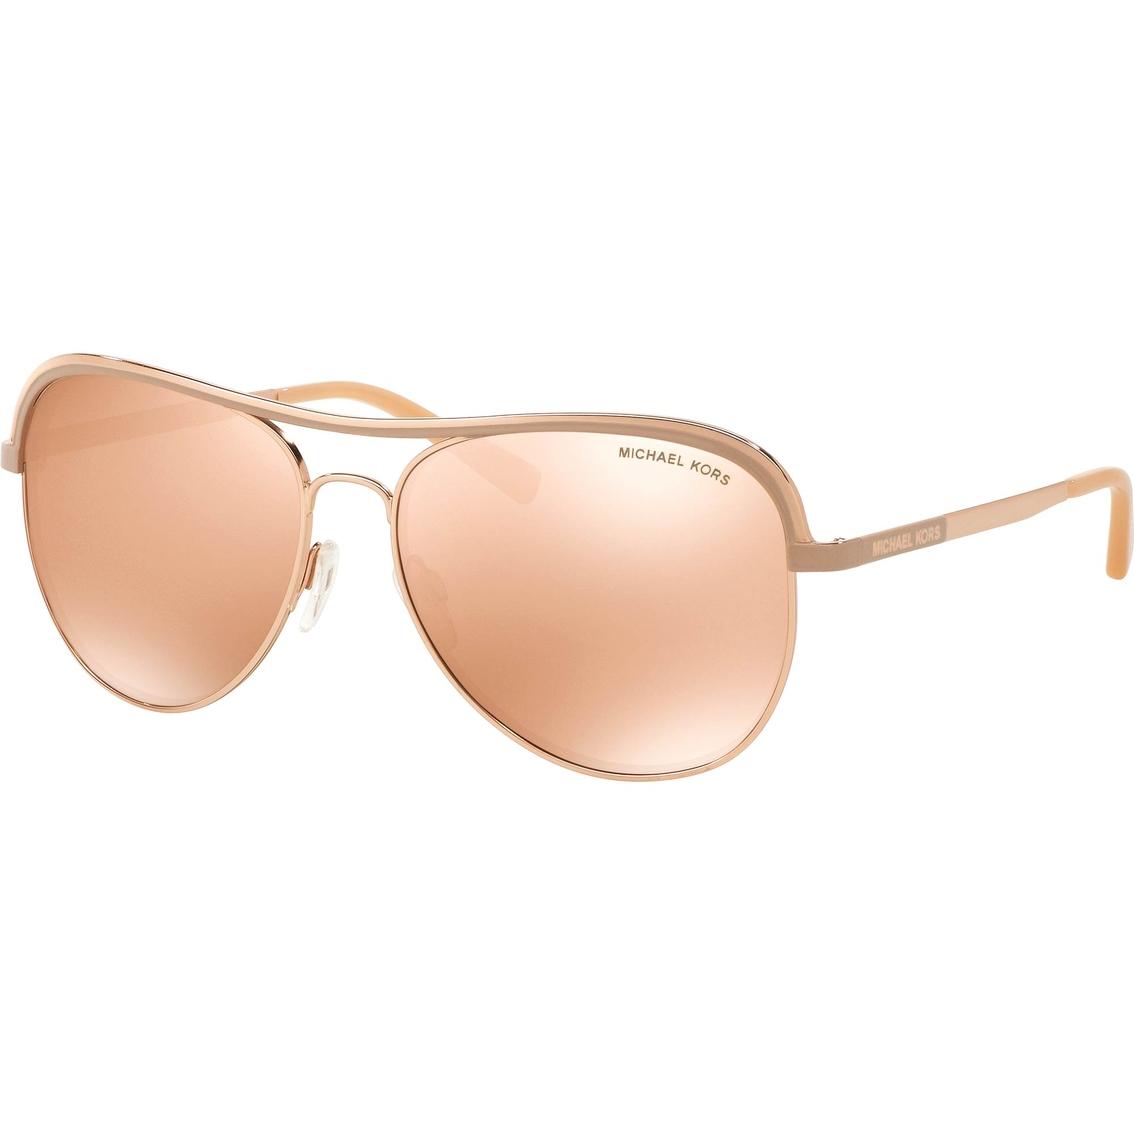 ff1c8500aa Michael Kors Aviator Sunglasses Omk 1012